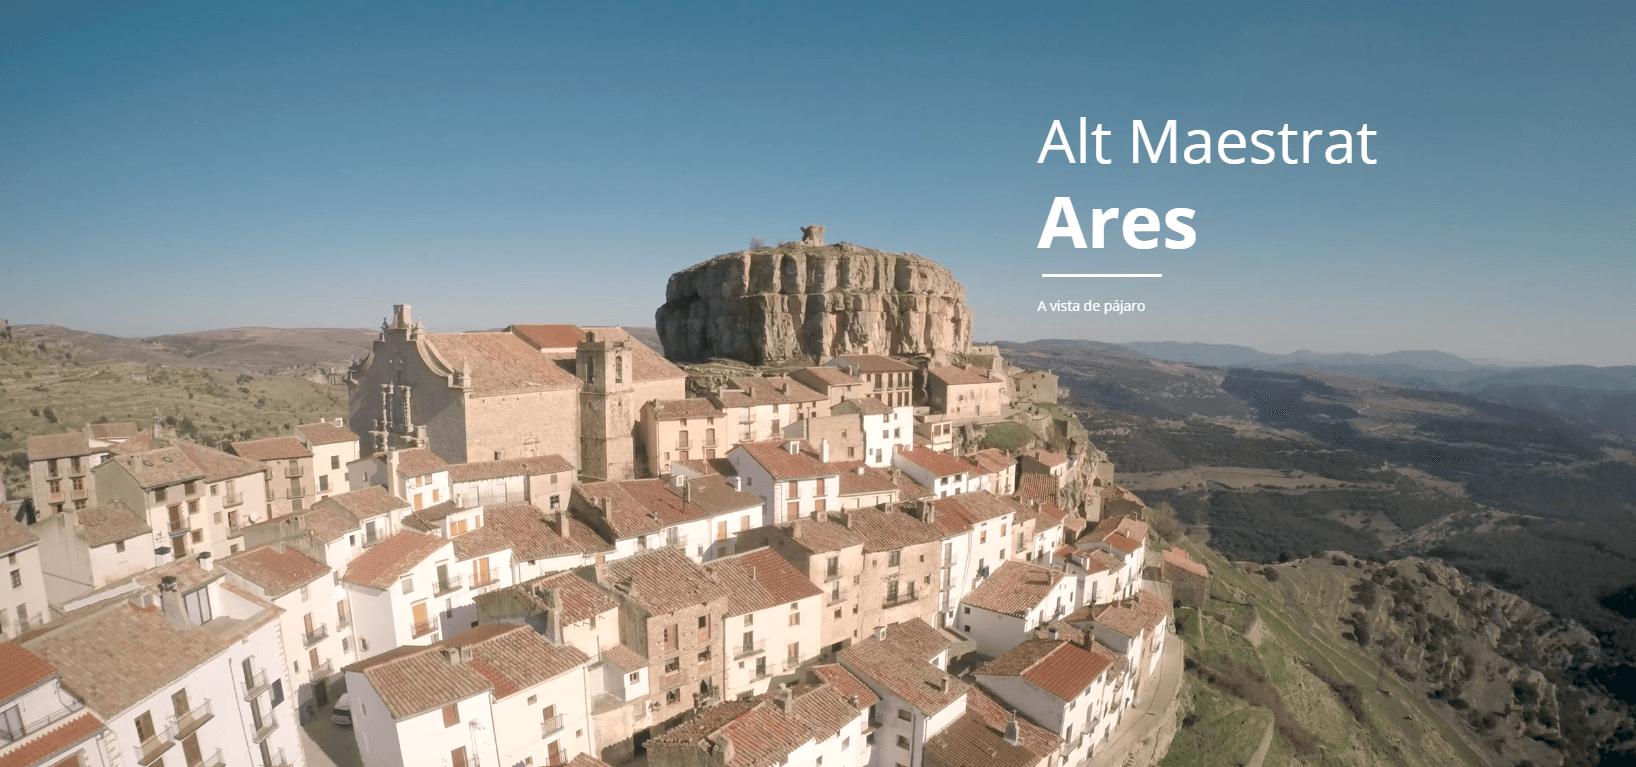 Ares del maestrat turismo en el interior de castell n for Turismo interior castellon